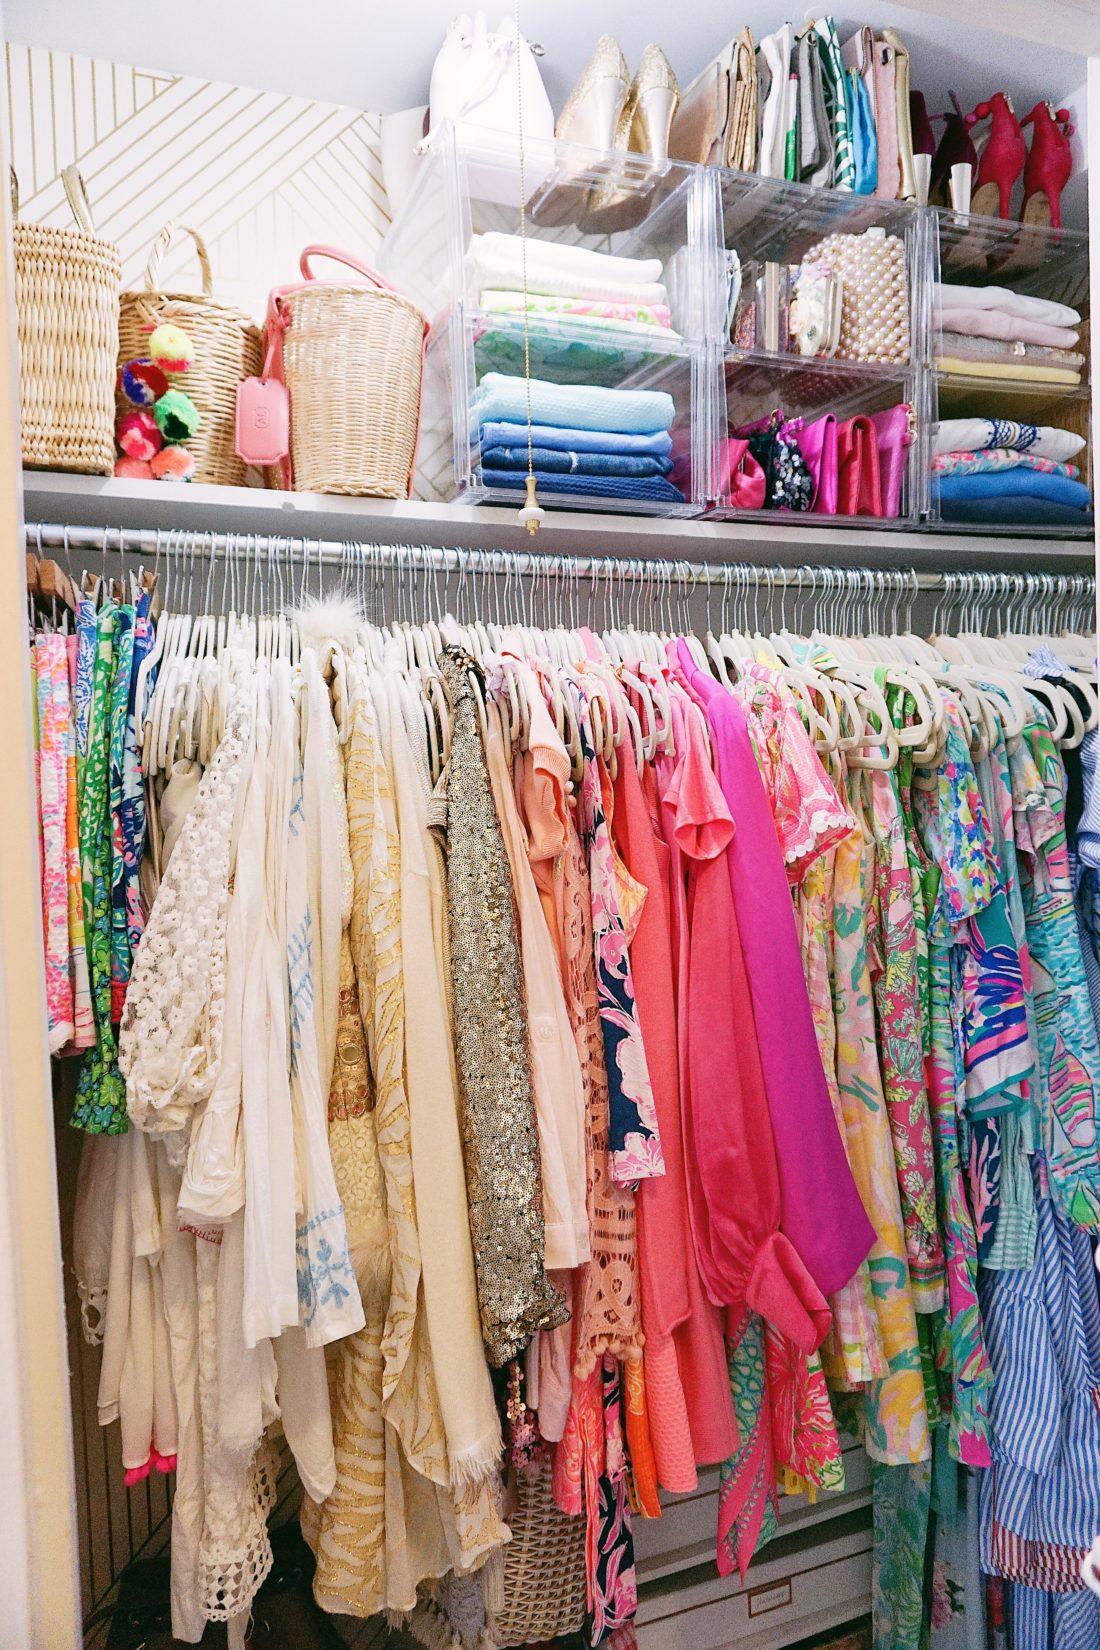 House of Turk closet organization summer wardrobe